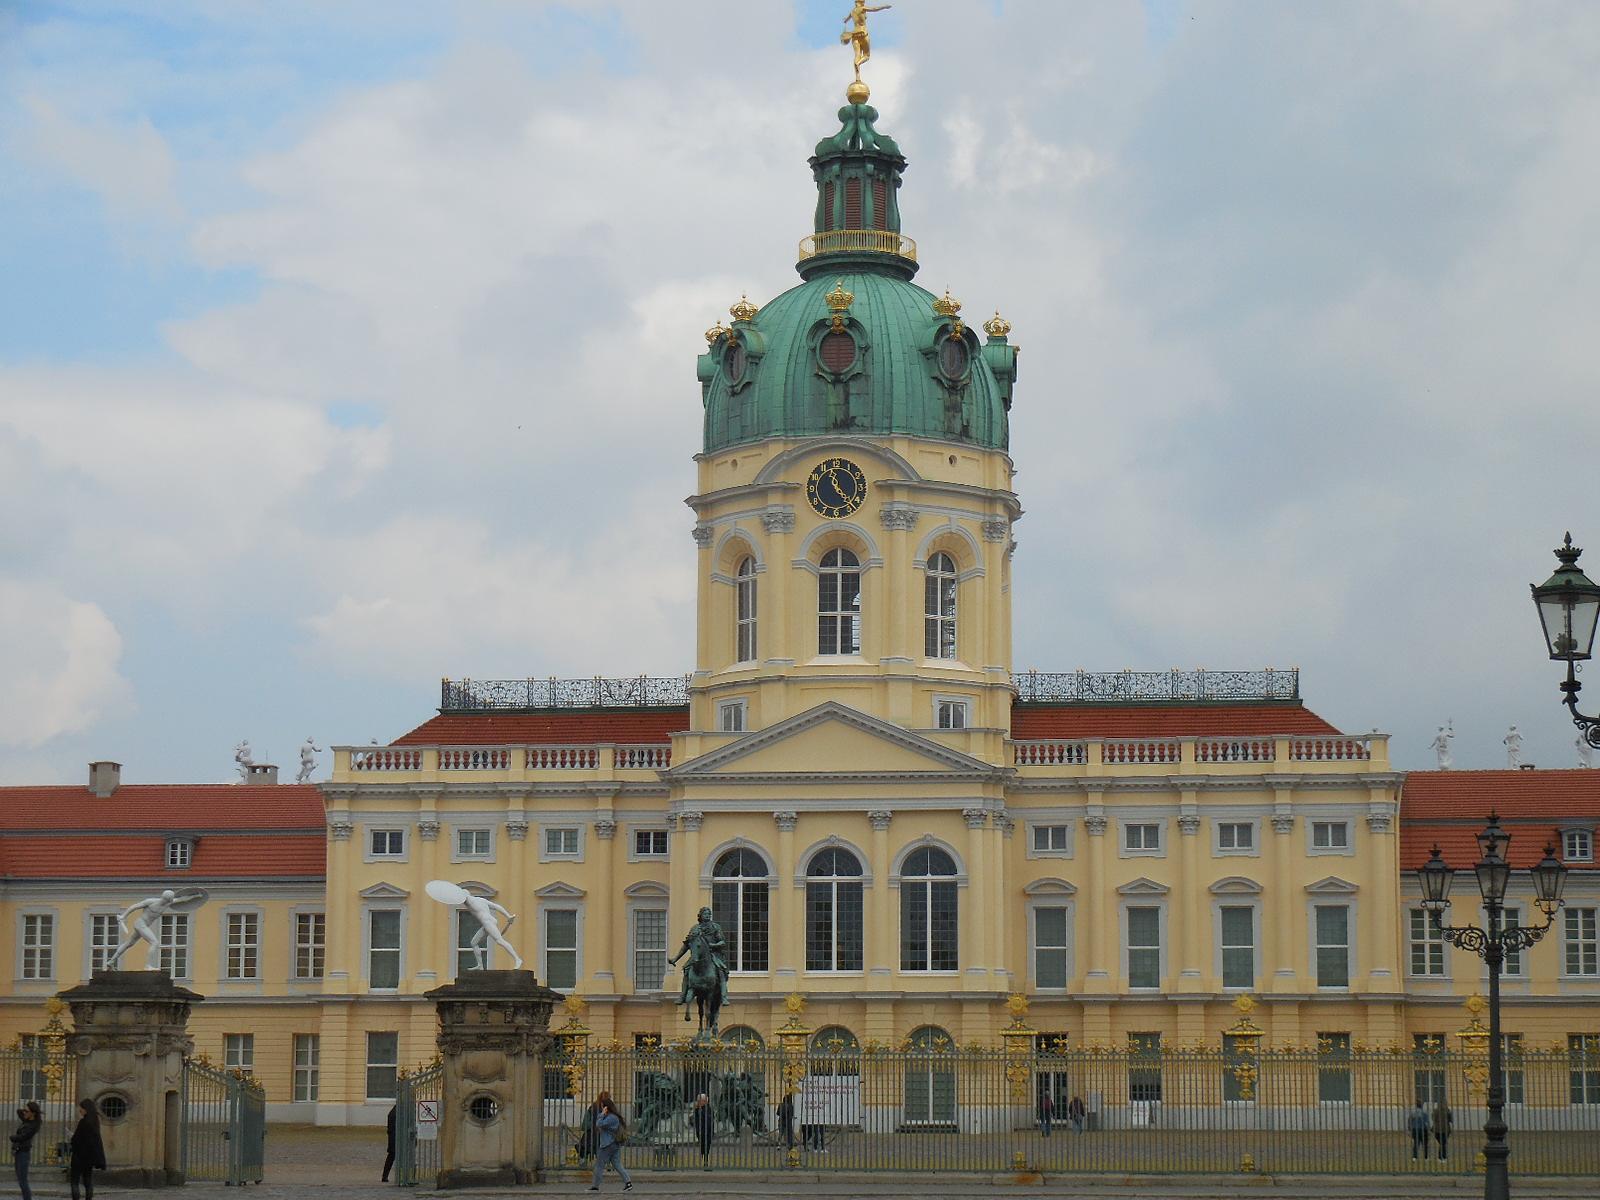 BerlinCharlottenburgext2